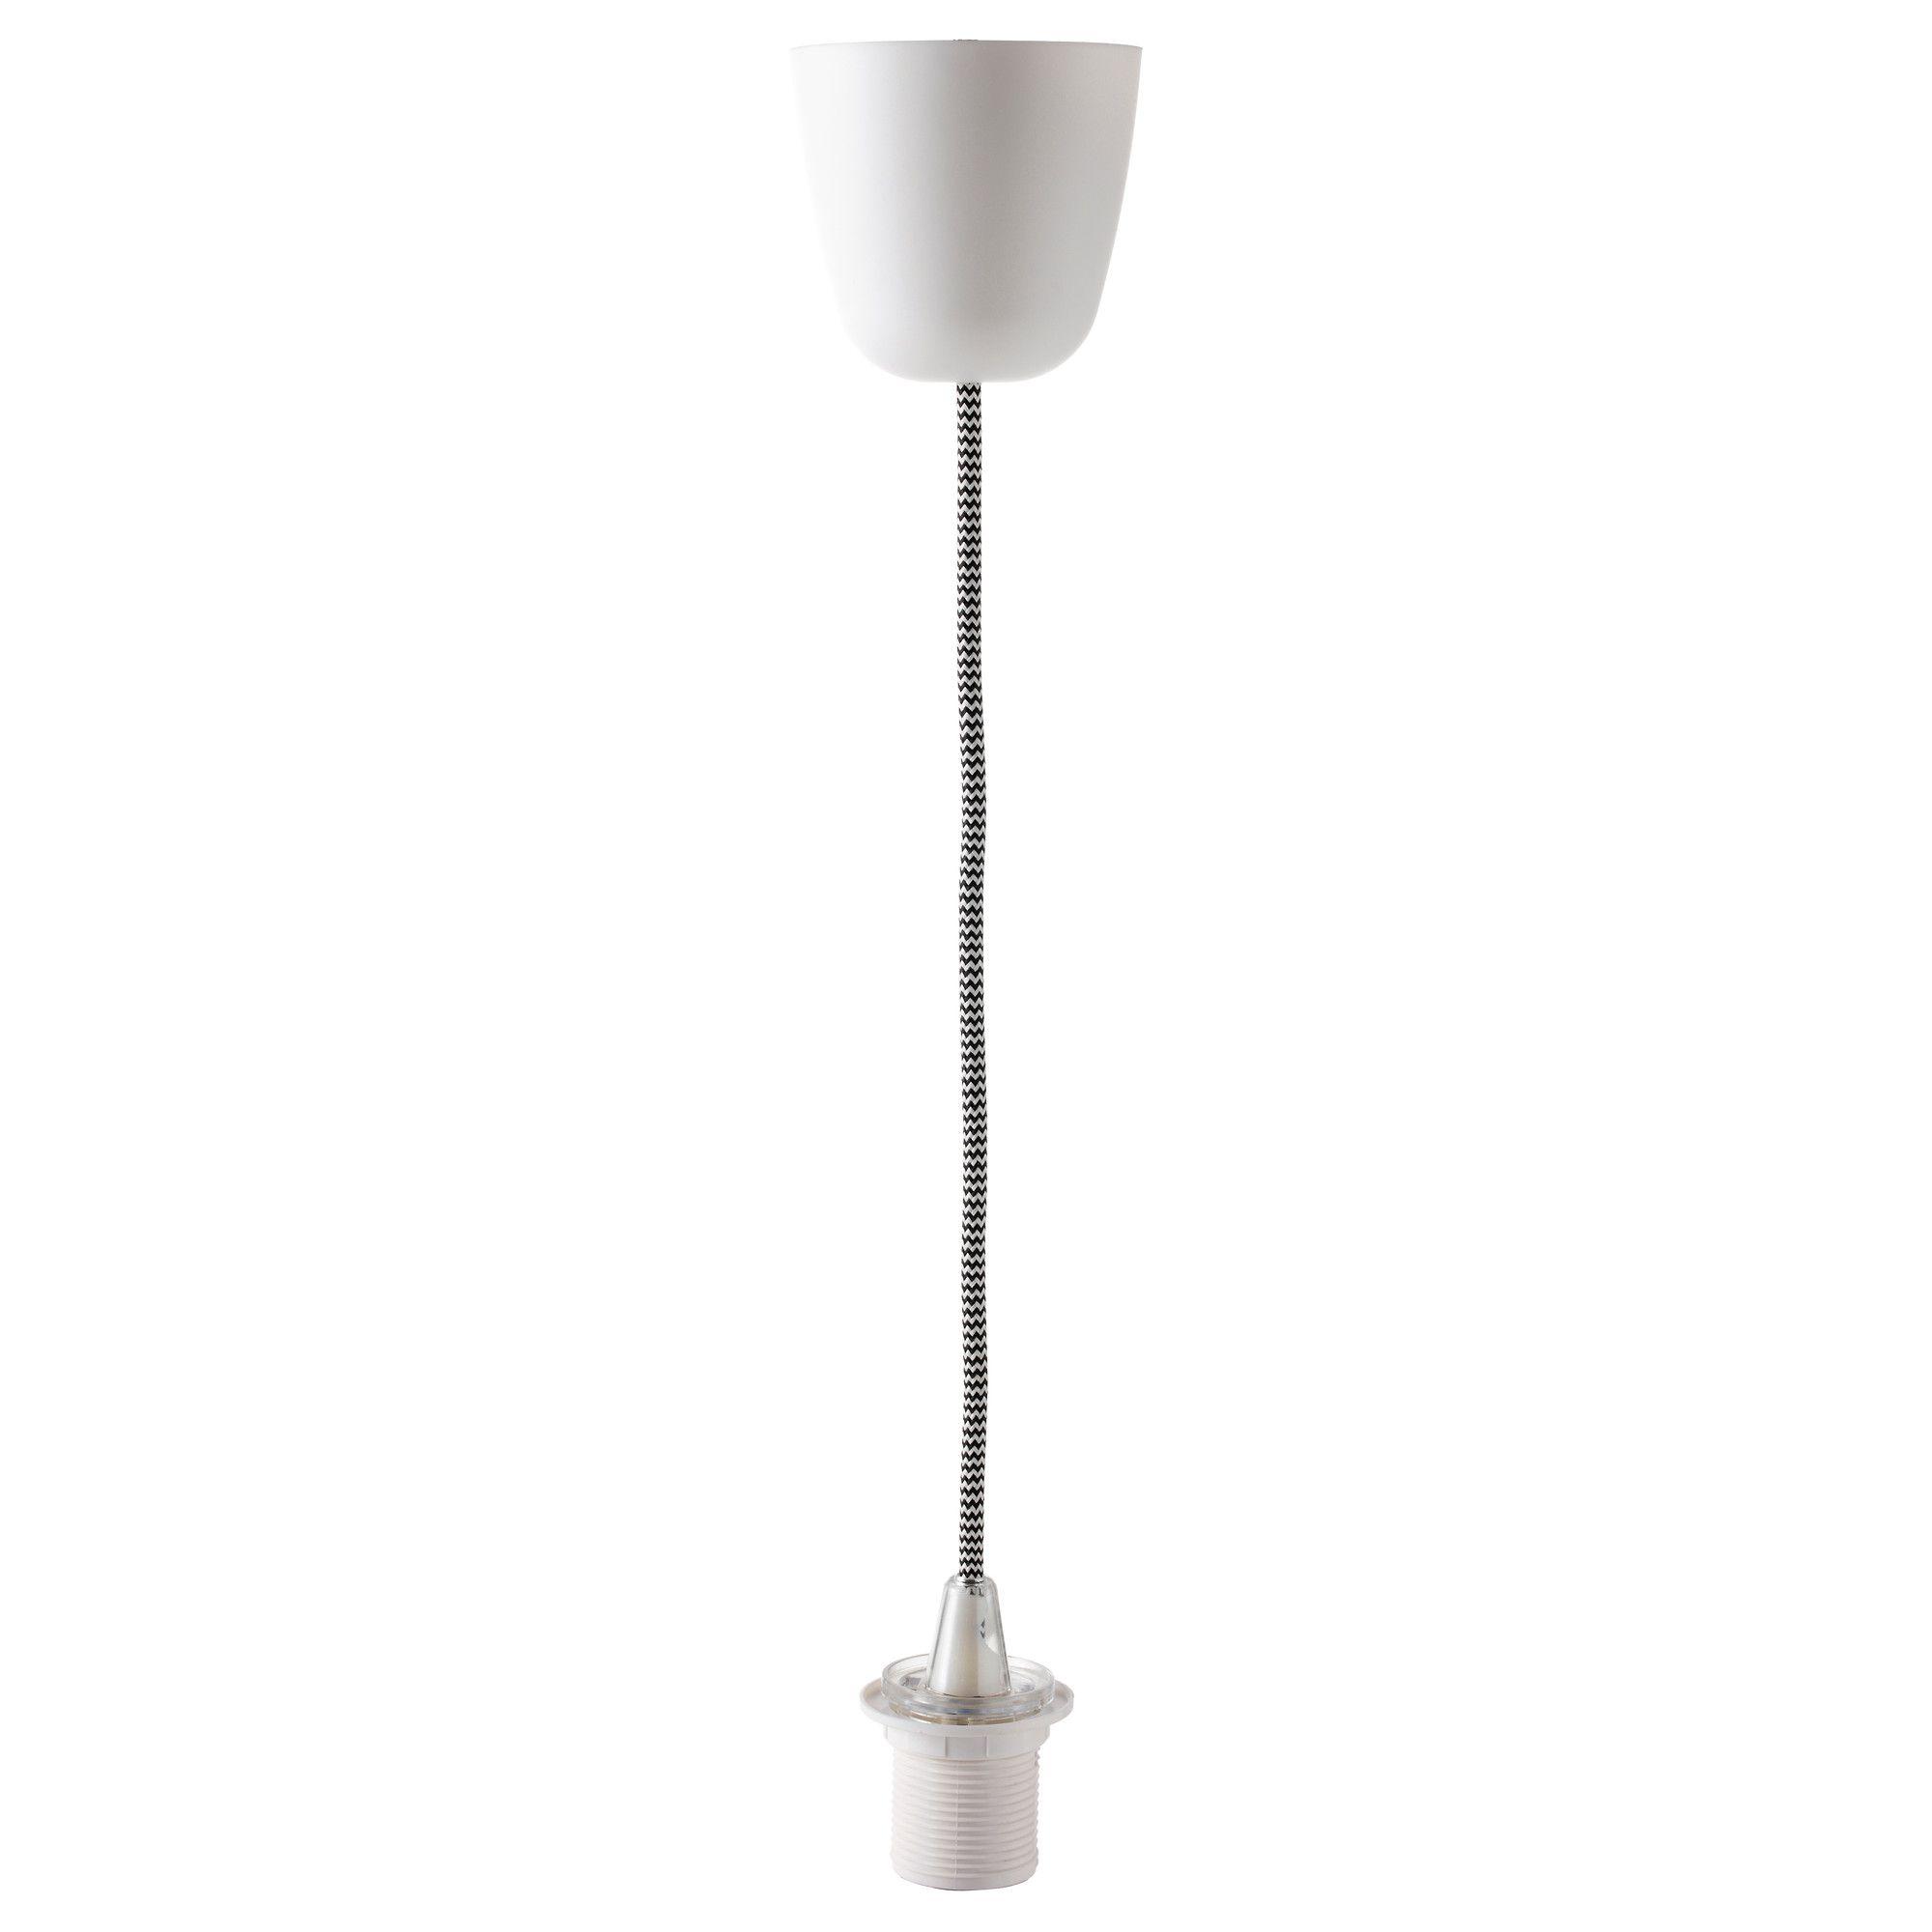 ikea cable lighting. SEKOND Cord Set - IKEA Ikea Cable Lighting